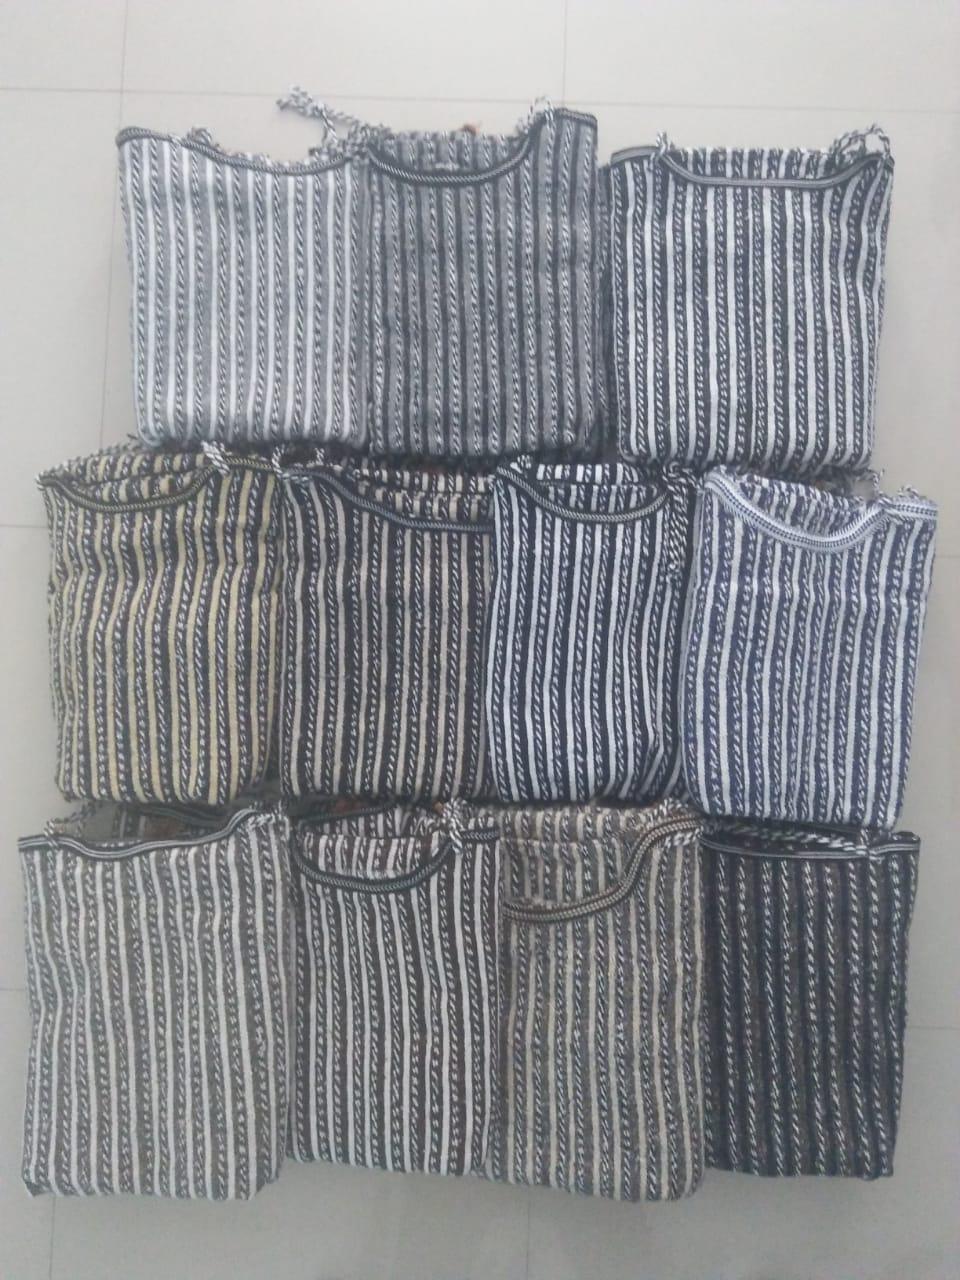 Handira OU KACHABA berbere en laine & Cotton جلابة قشابة